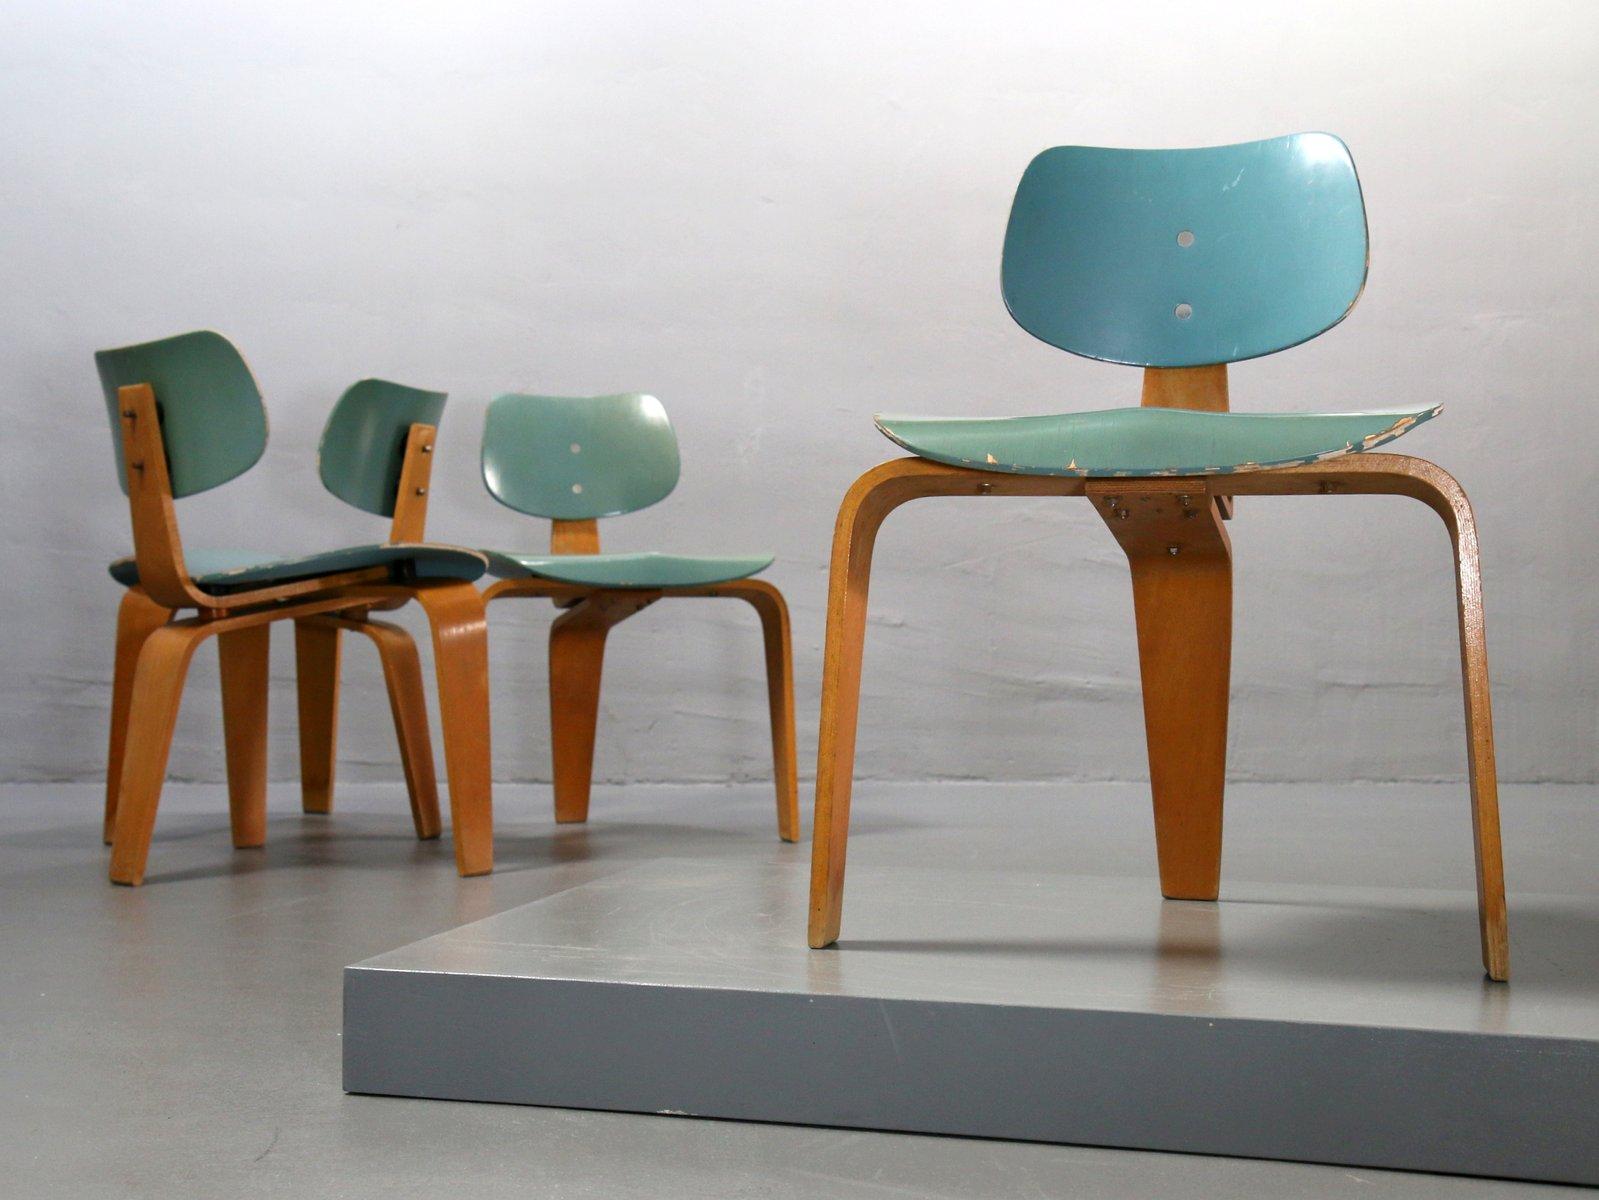 Tavolo da pranzo con sedie vintage di egon eiermann per spieth holztechnik set di 5 in vendita - Sedie per tavolo da pranzo ...